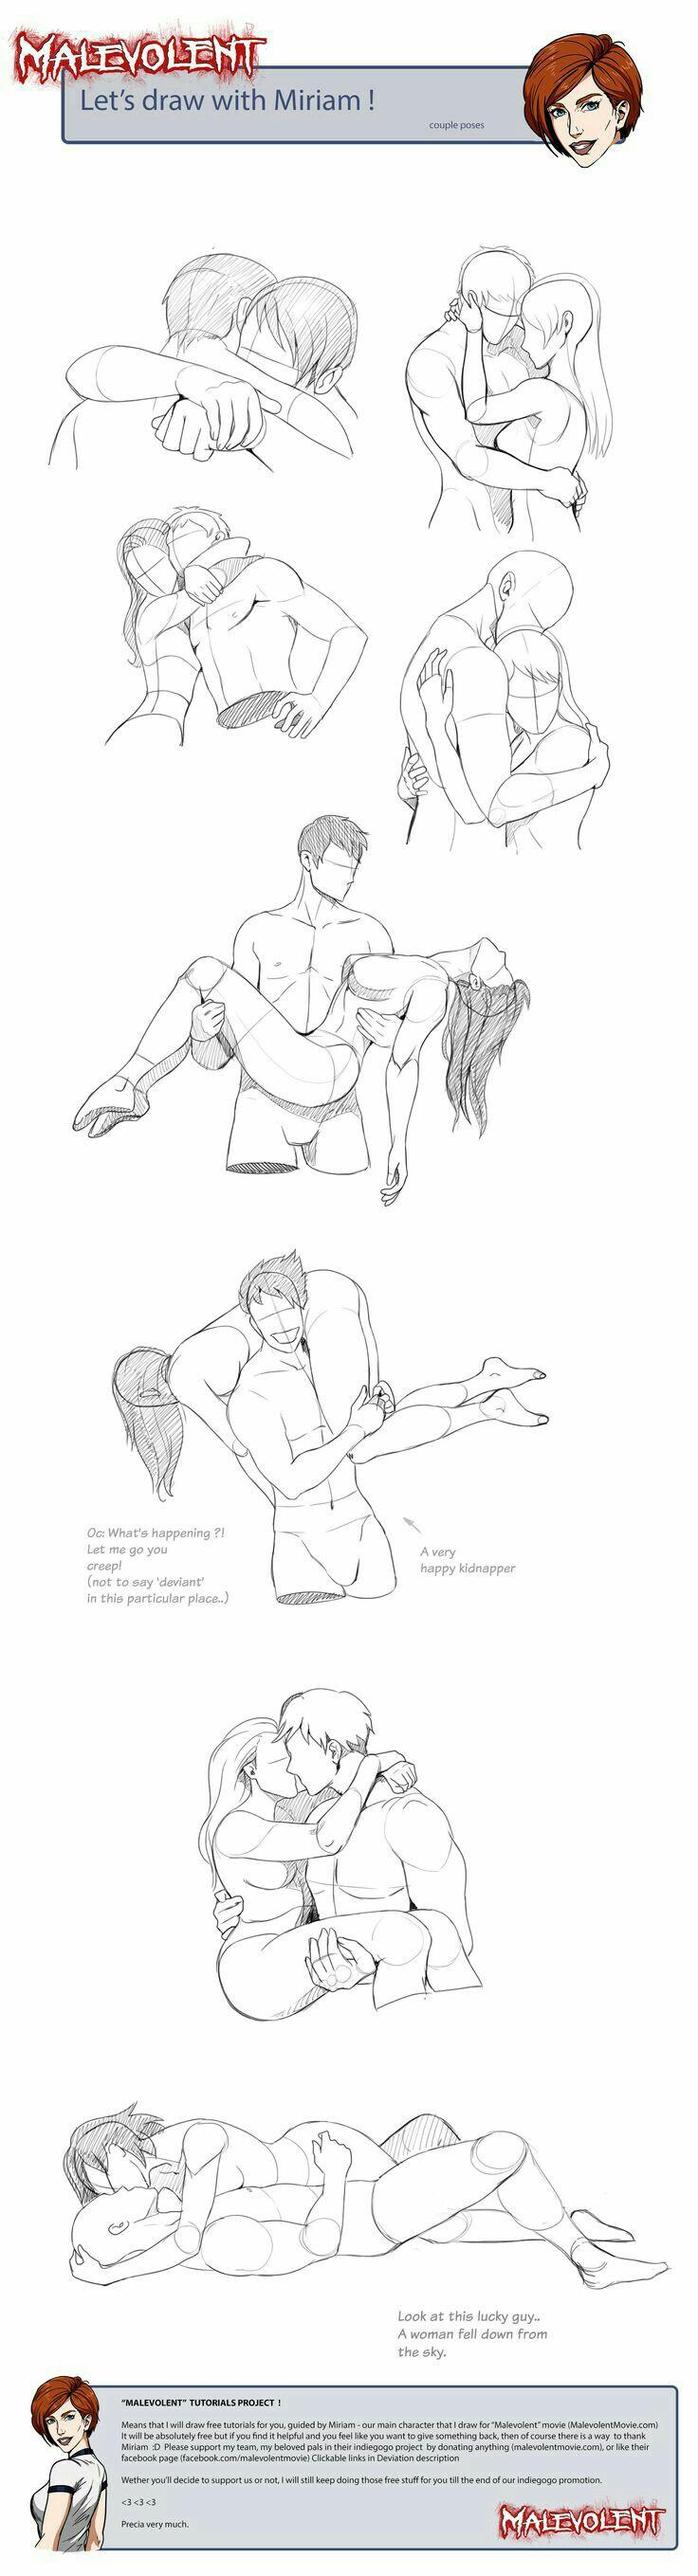 Drawn hug two person Comics People to hugging How